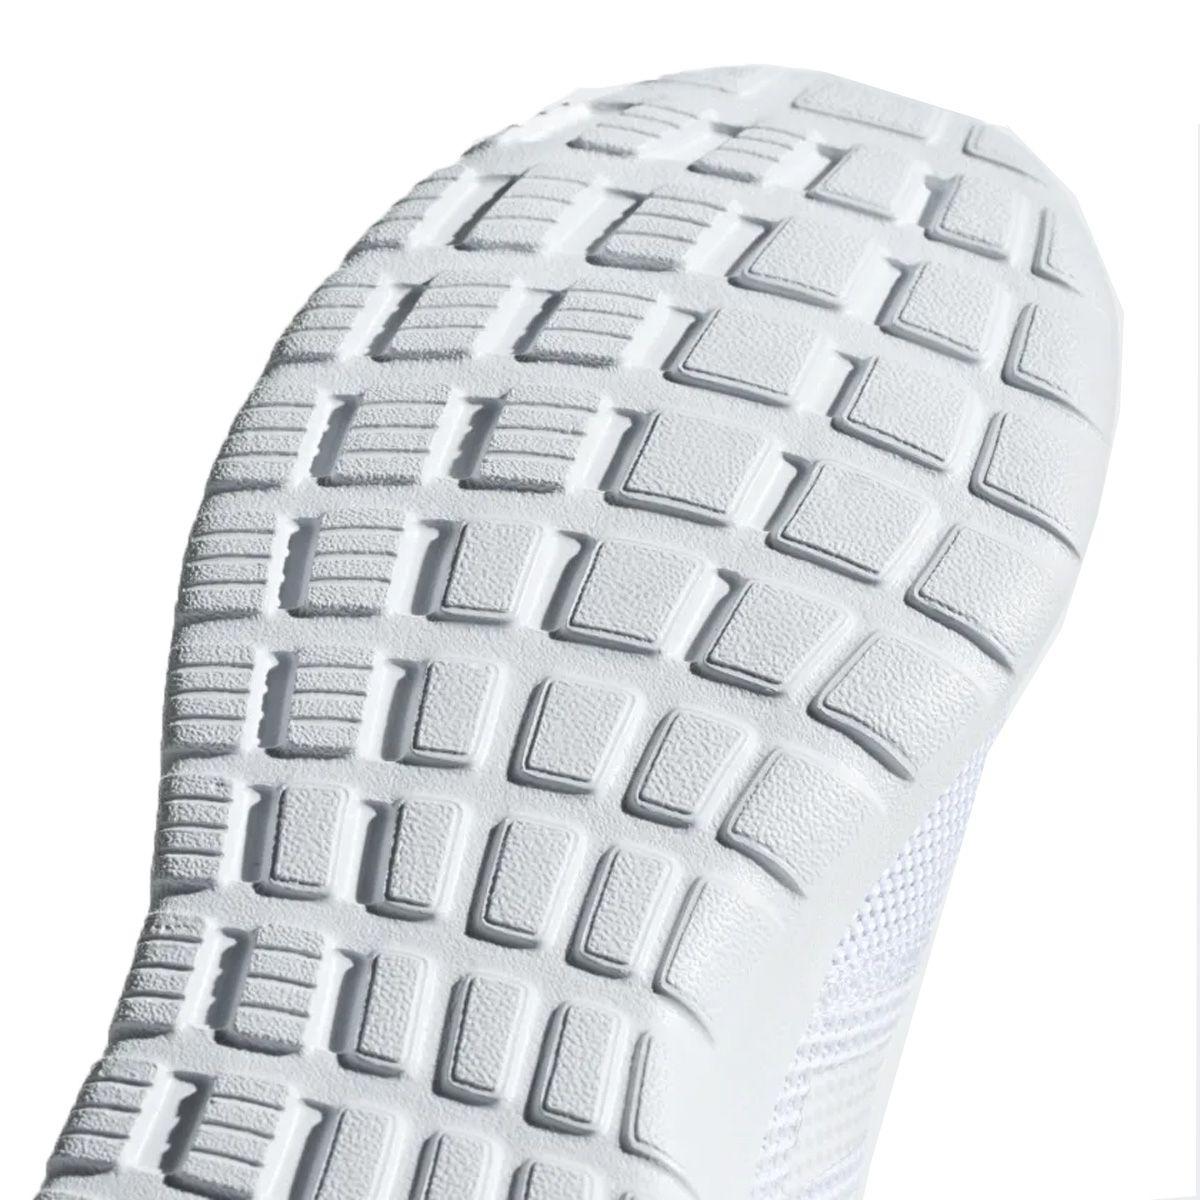 Tênis Adidas Lite Racer Reborn Masculino